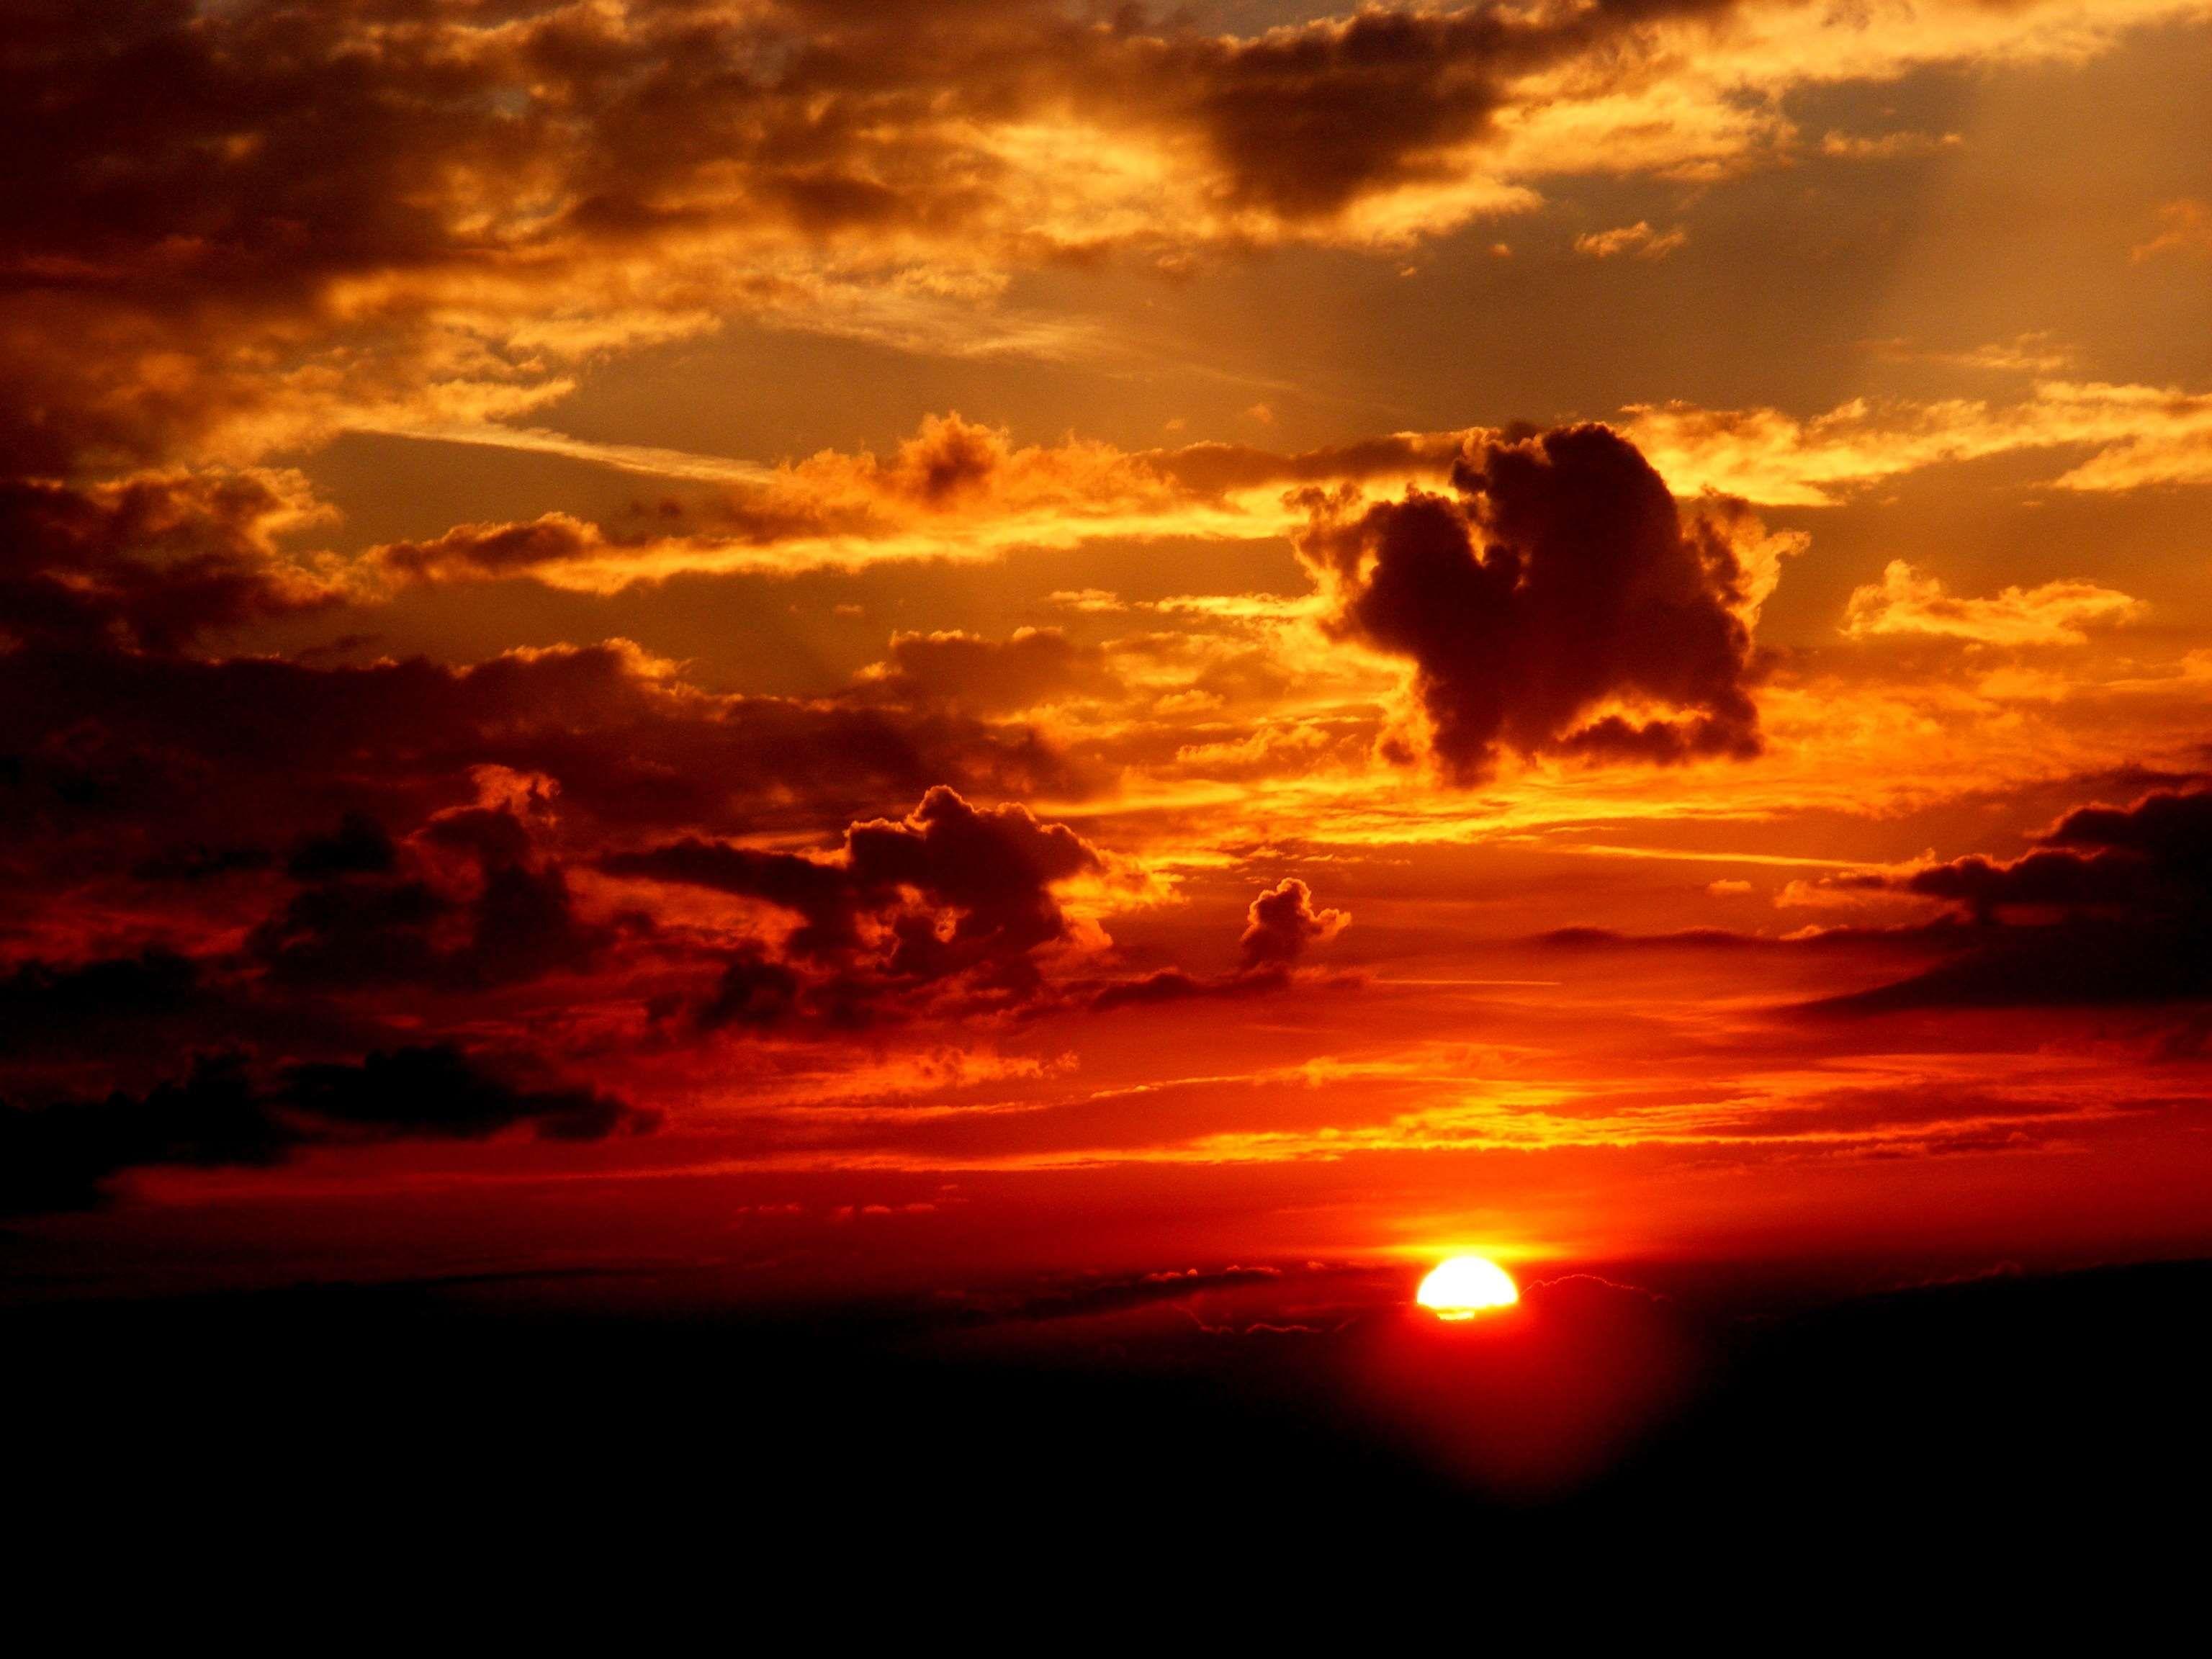 Clouds Dawn Dusk Sky Sun Sunrise Sunset Public Domain Images Sunset Photography Sunset Pictures Sunset Photos